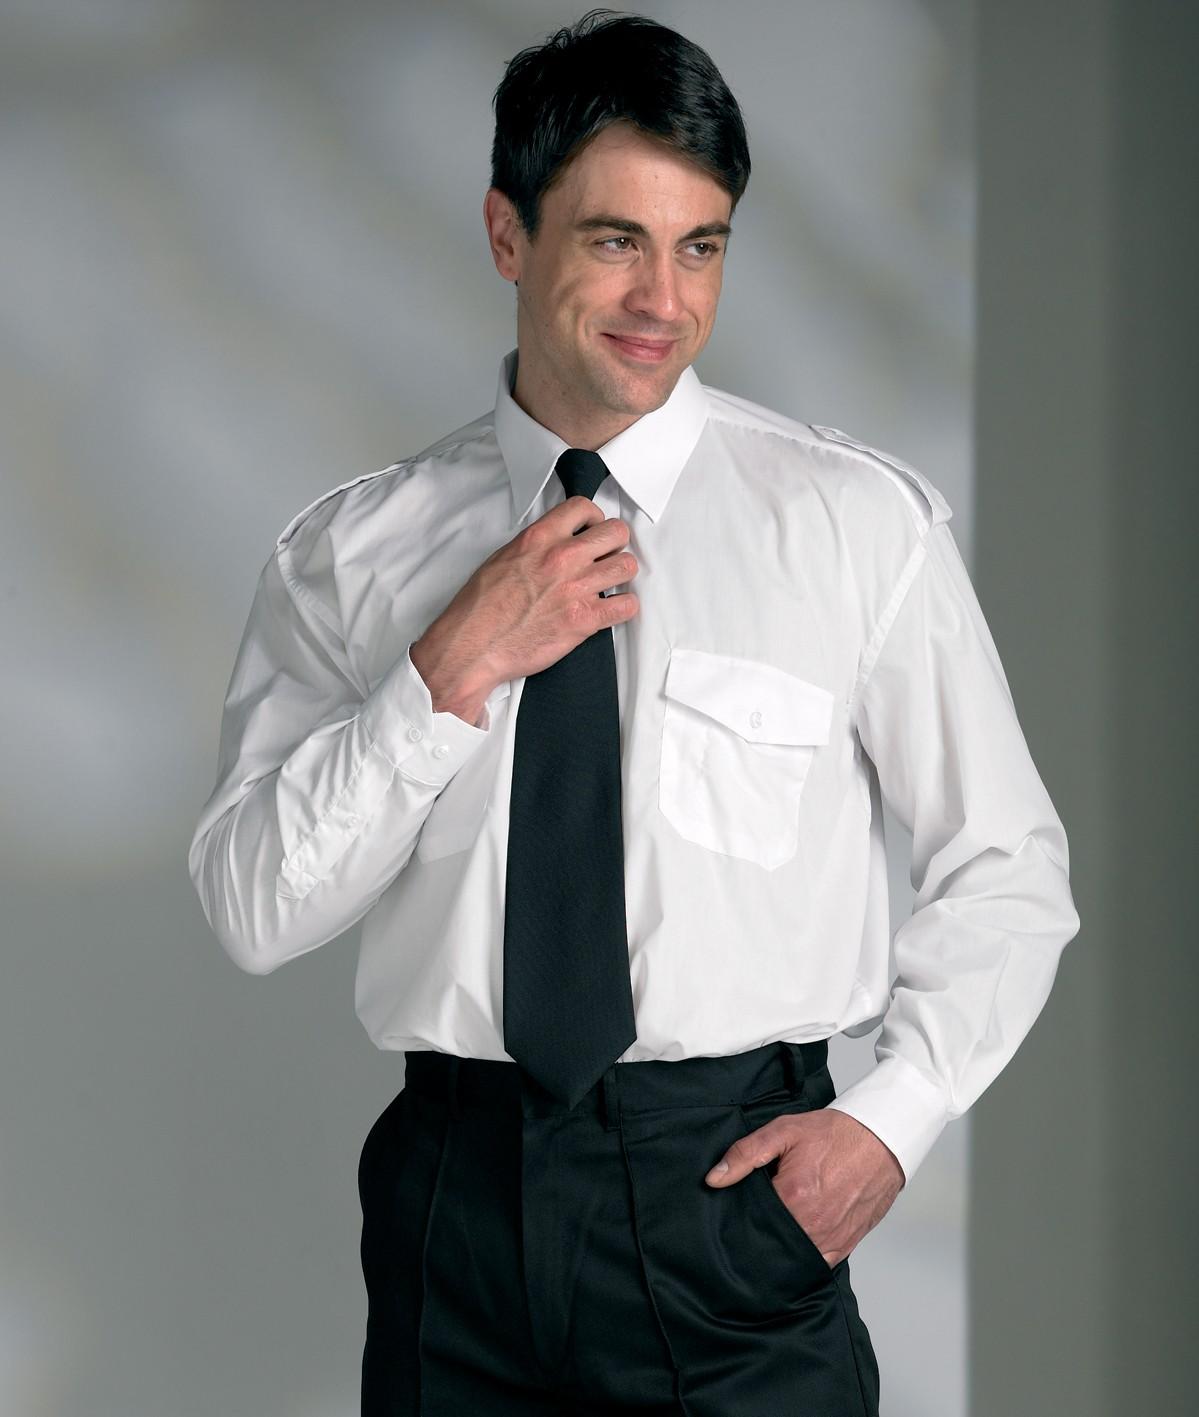 Male Pilot Shirt White